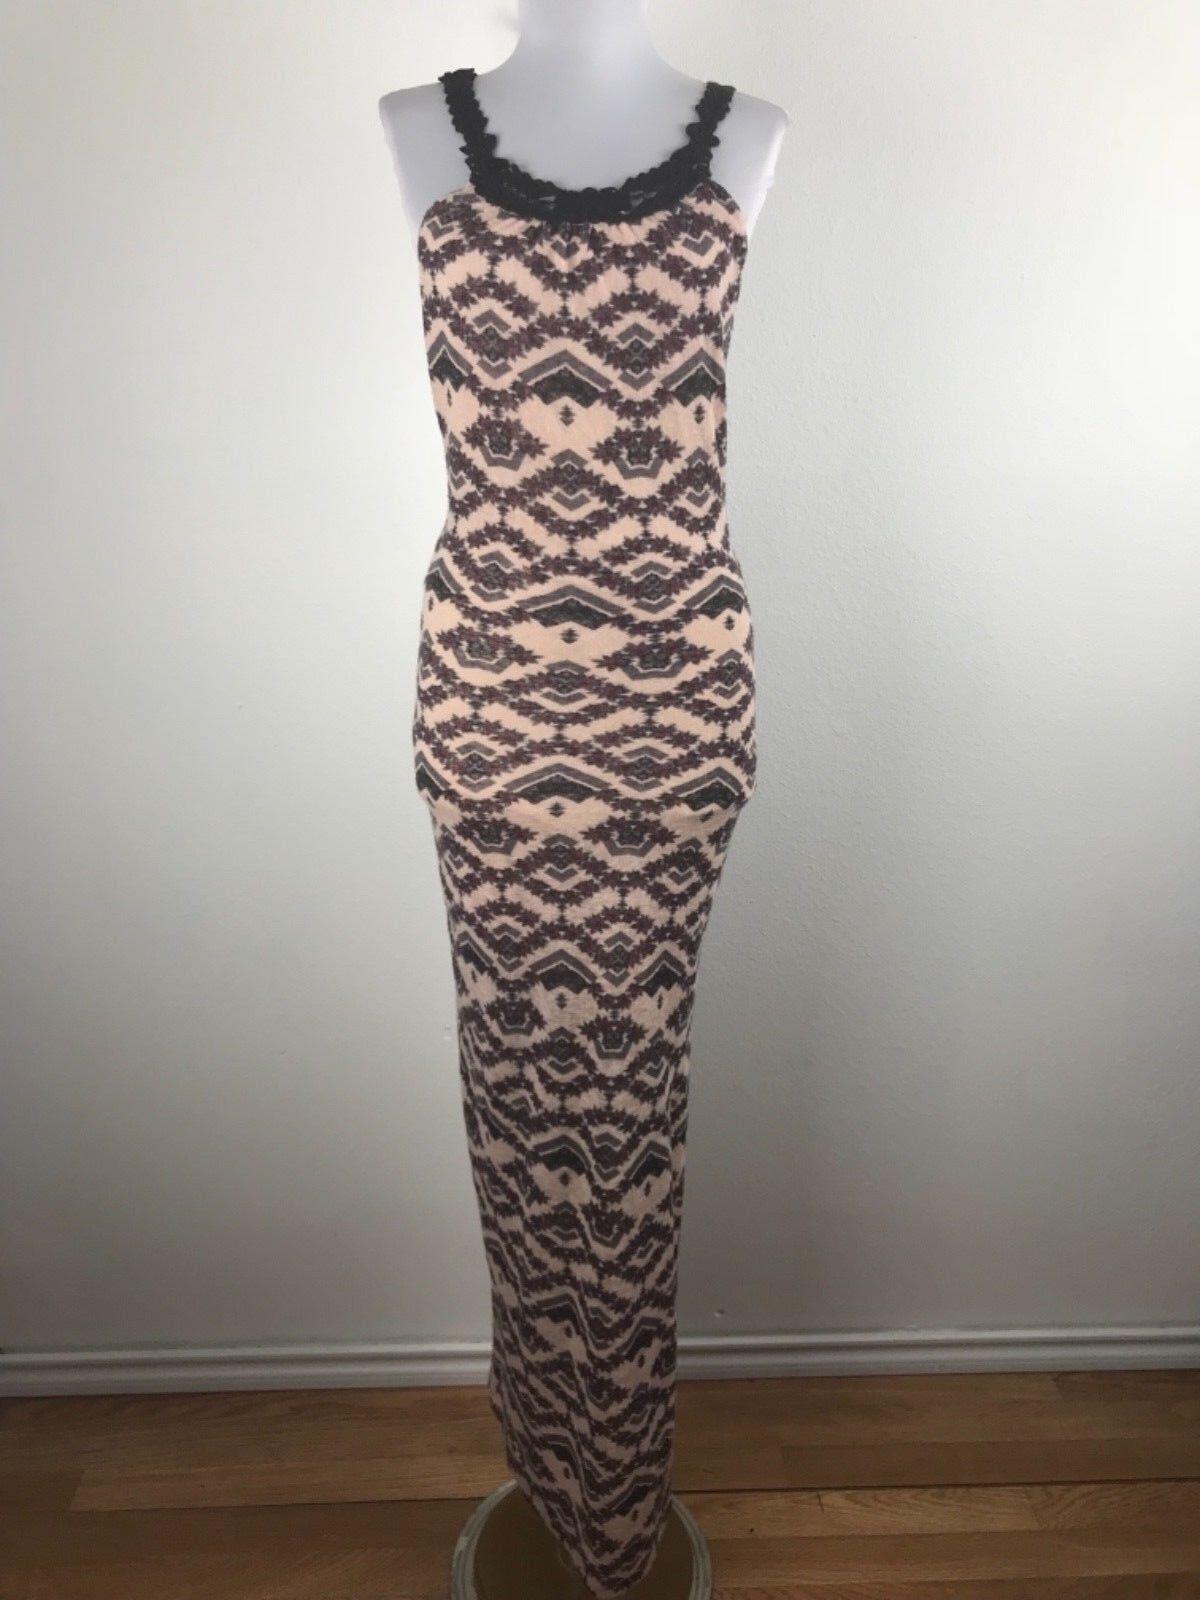 Free People Maxi Dress Sz M Rosa Floral Crochet Sleeveless Side Vent Racer Back